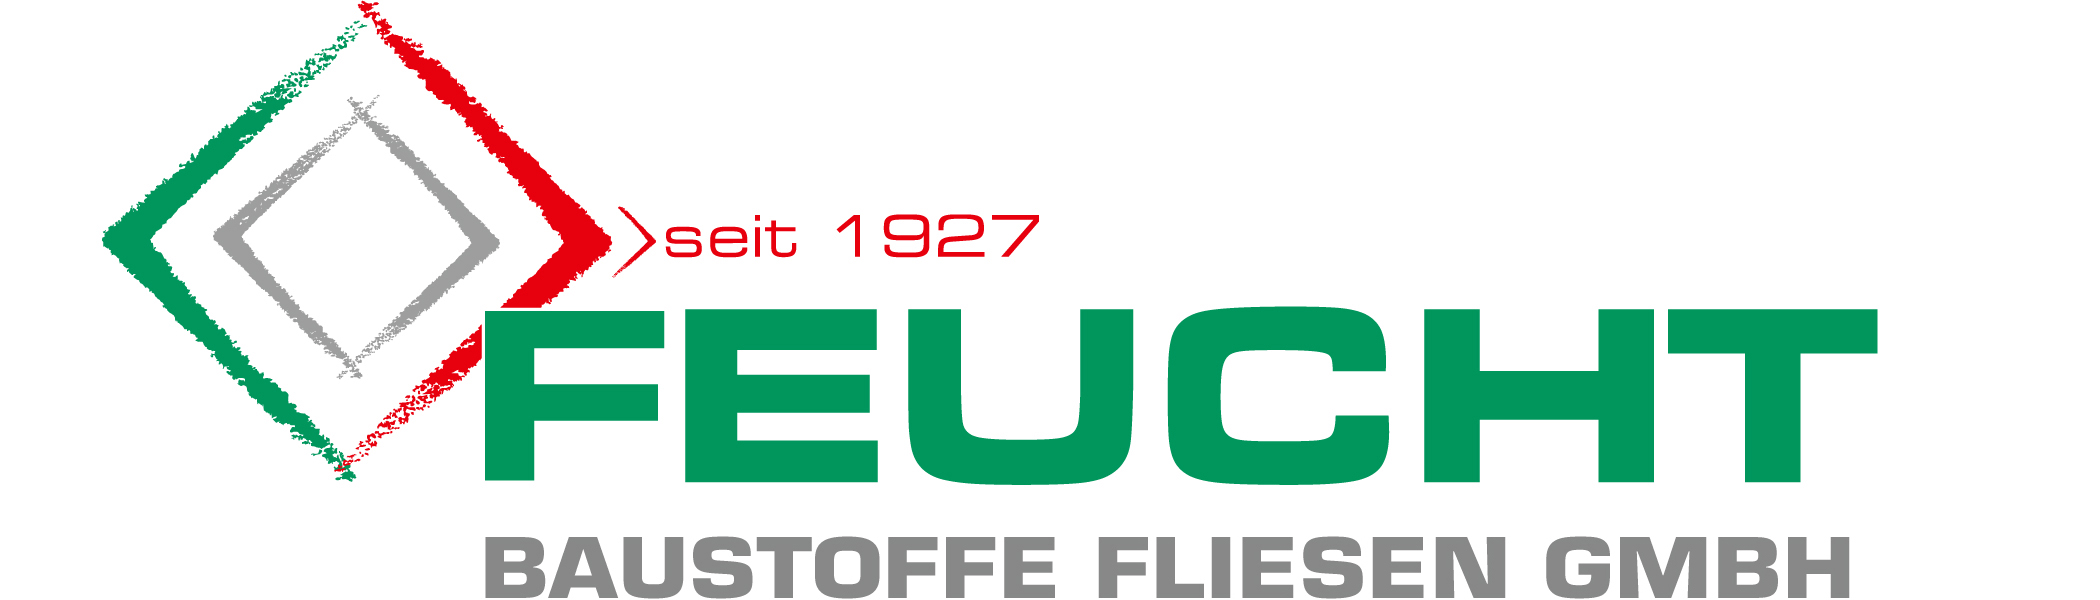 Feucht-Baustoffe Fliesen GmbH